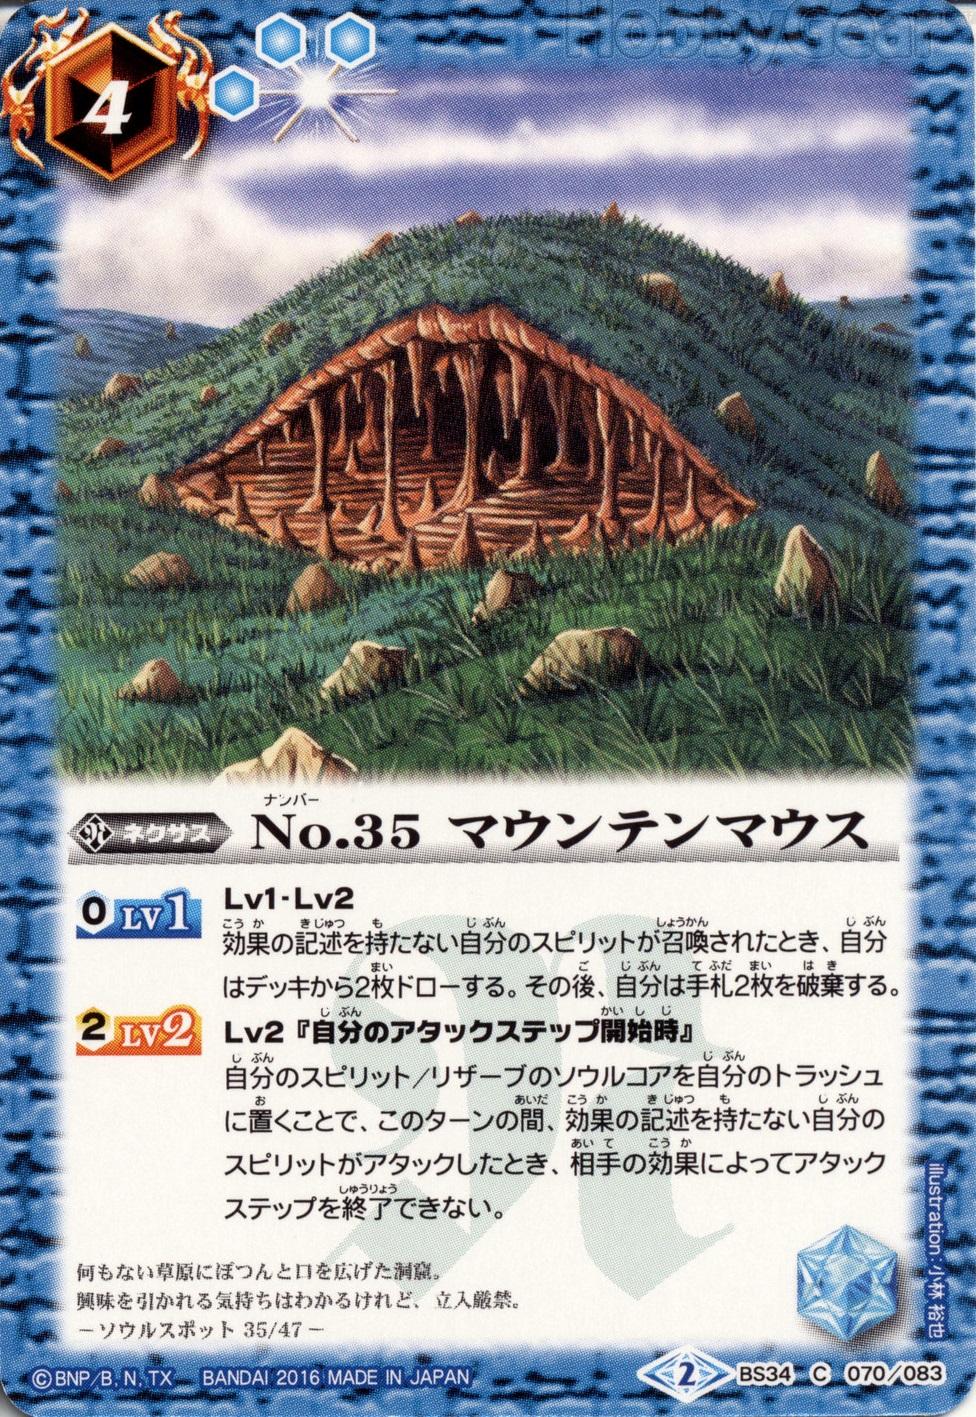 No. 35 Mountain Mouth